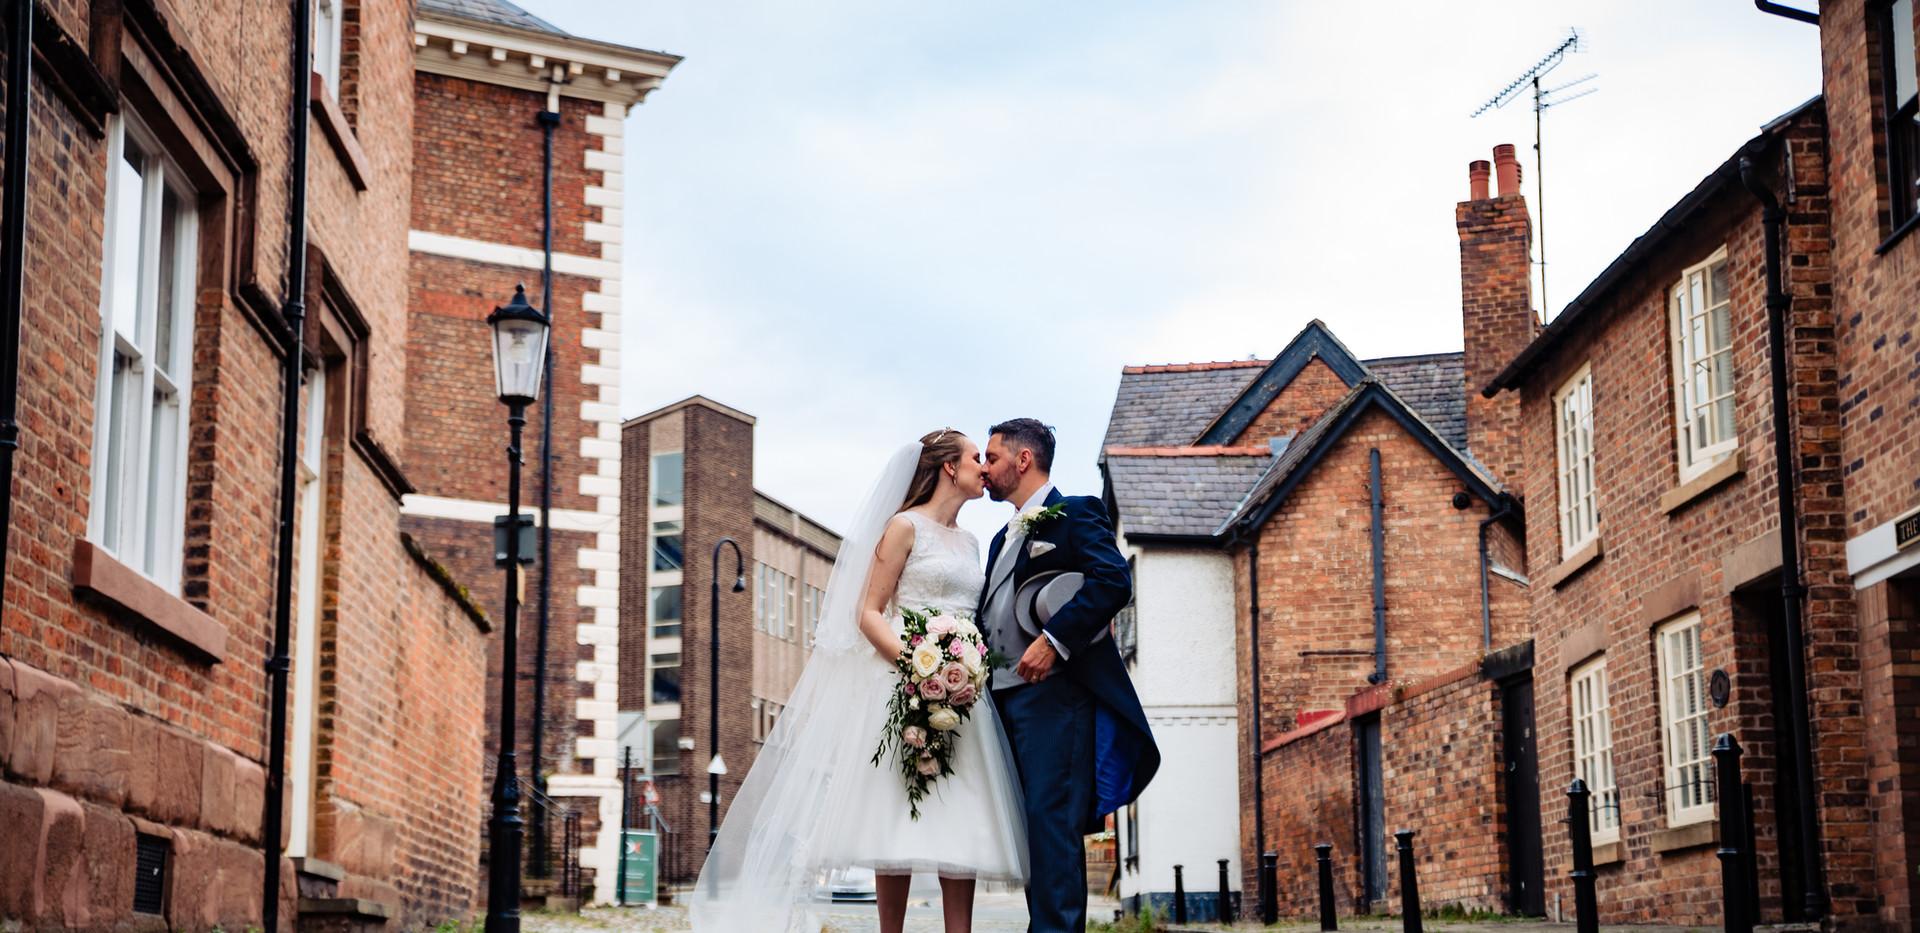 Oddfellows Wedding Photography___25.jpg